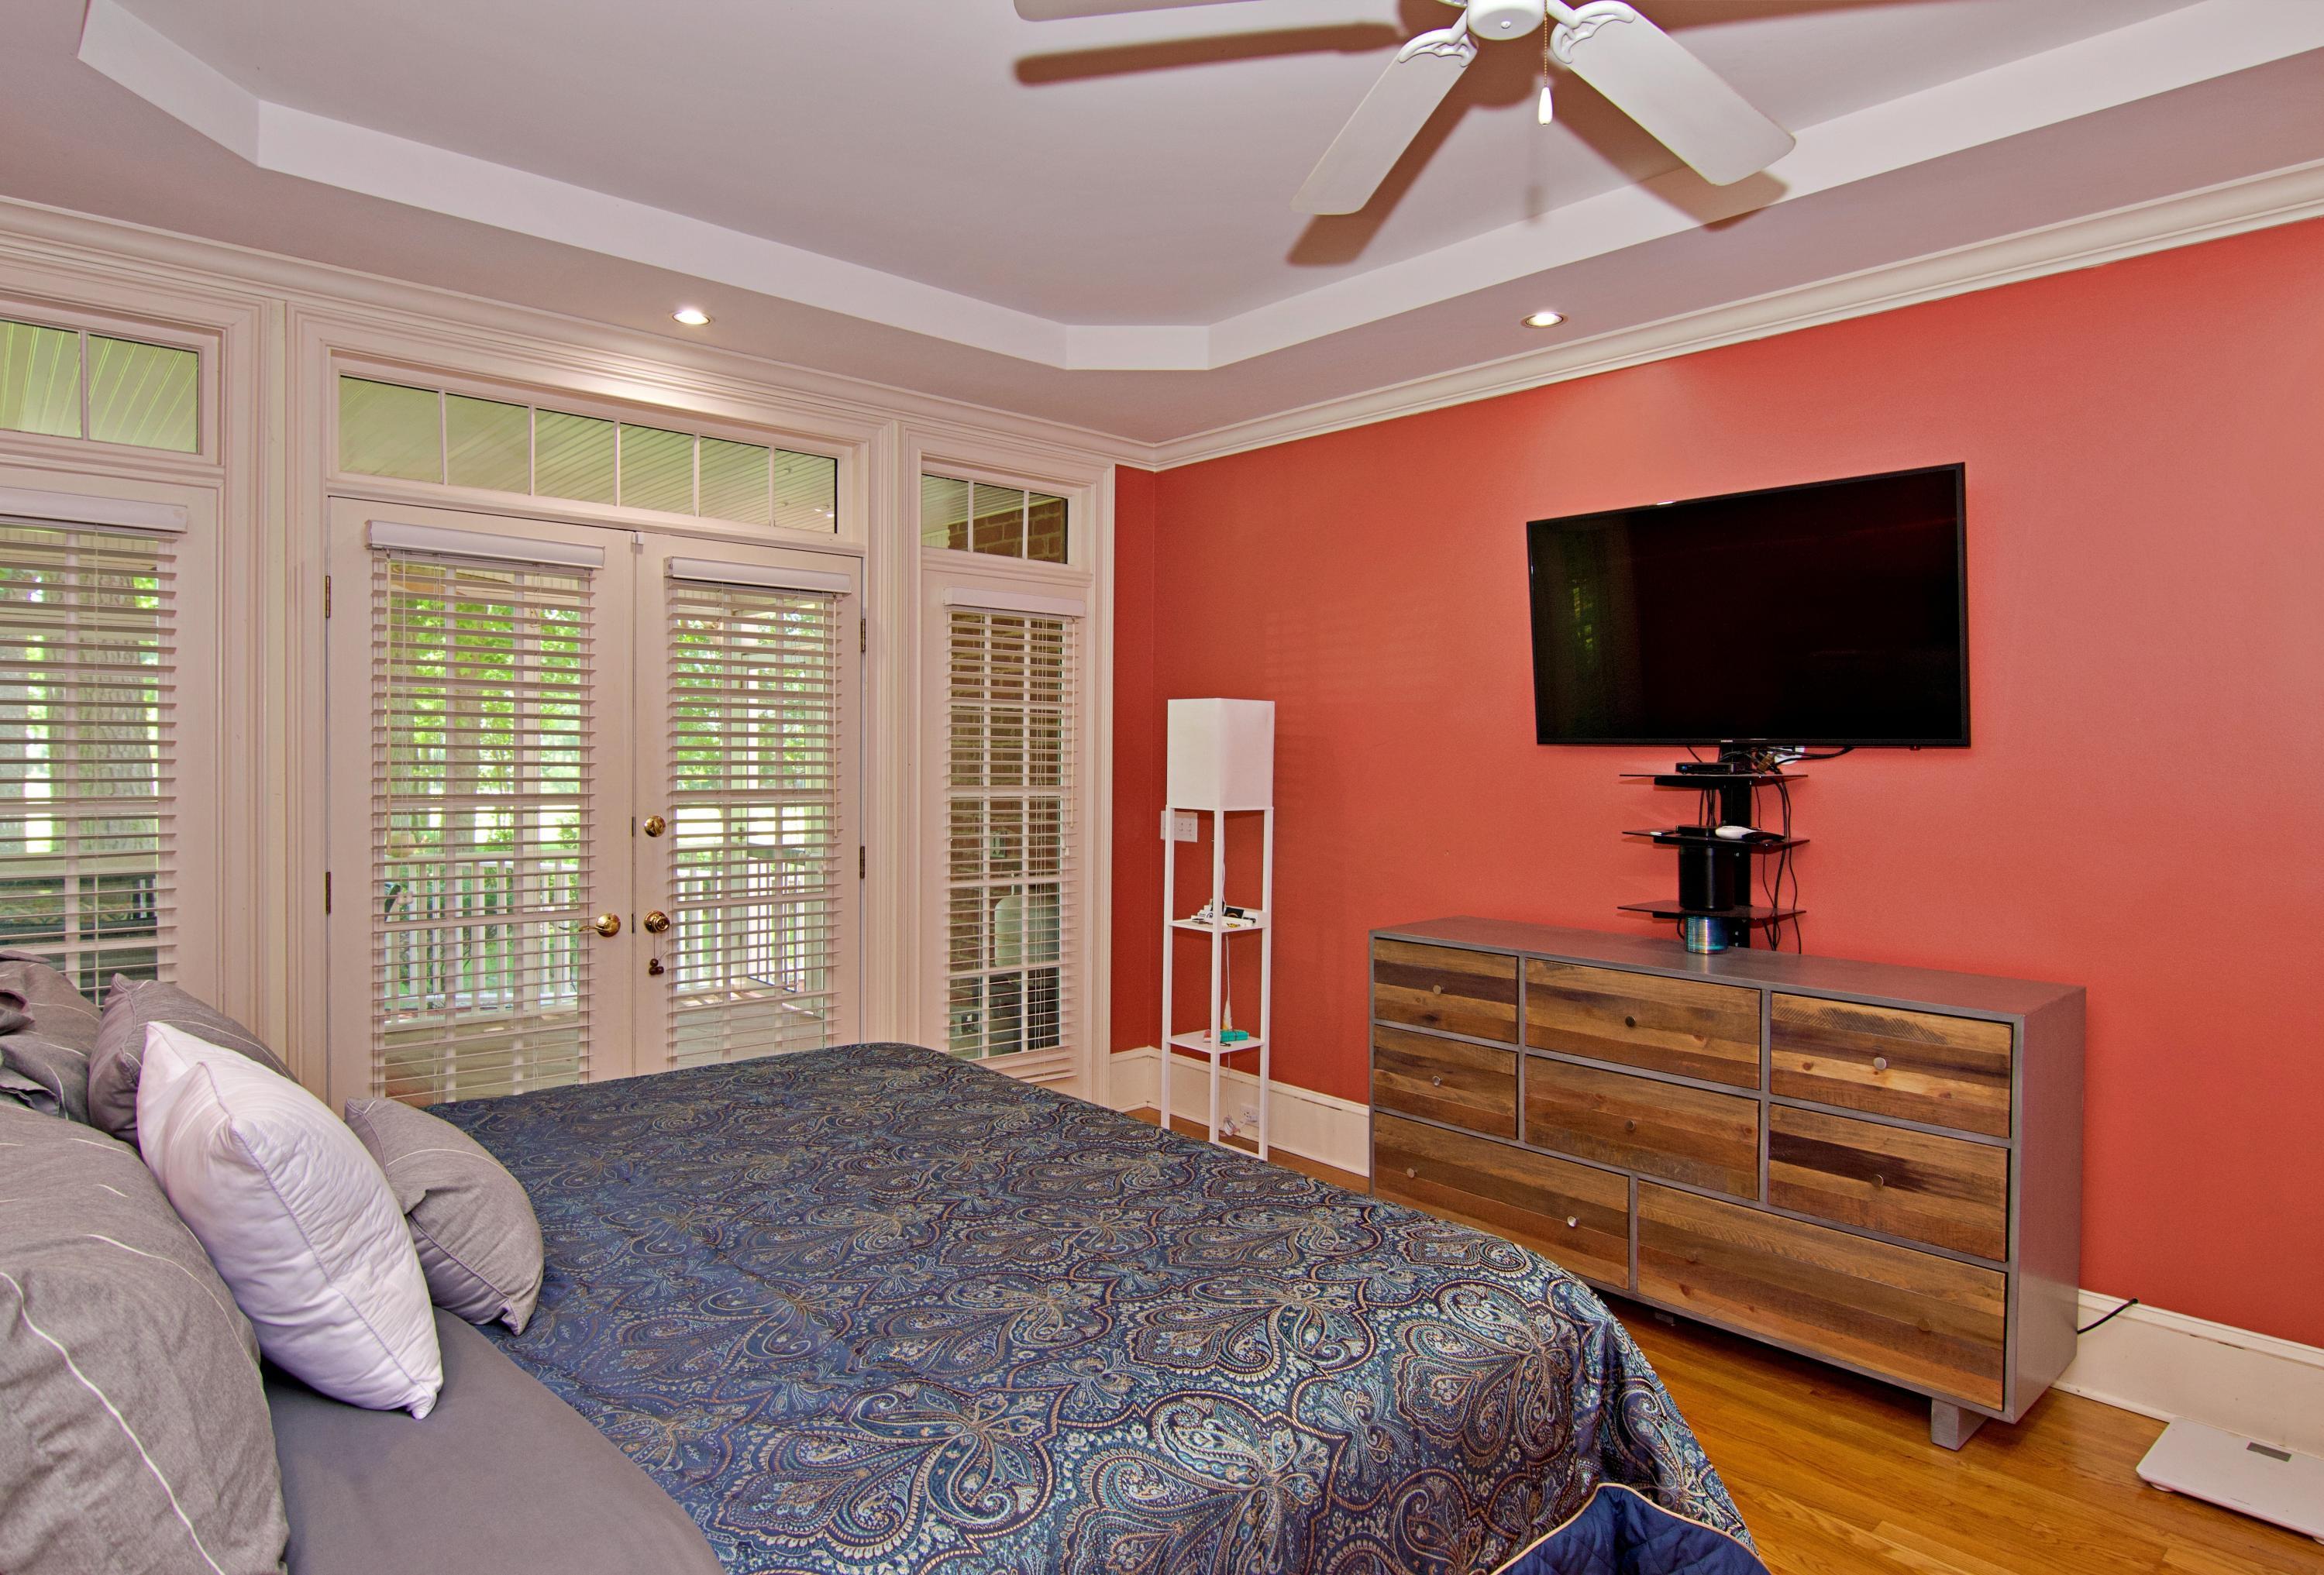 Coosaw Creek Country Club Homes For Sale - 4219 Buck Creek, North Charleston, SC - 7